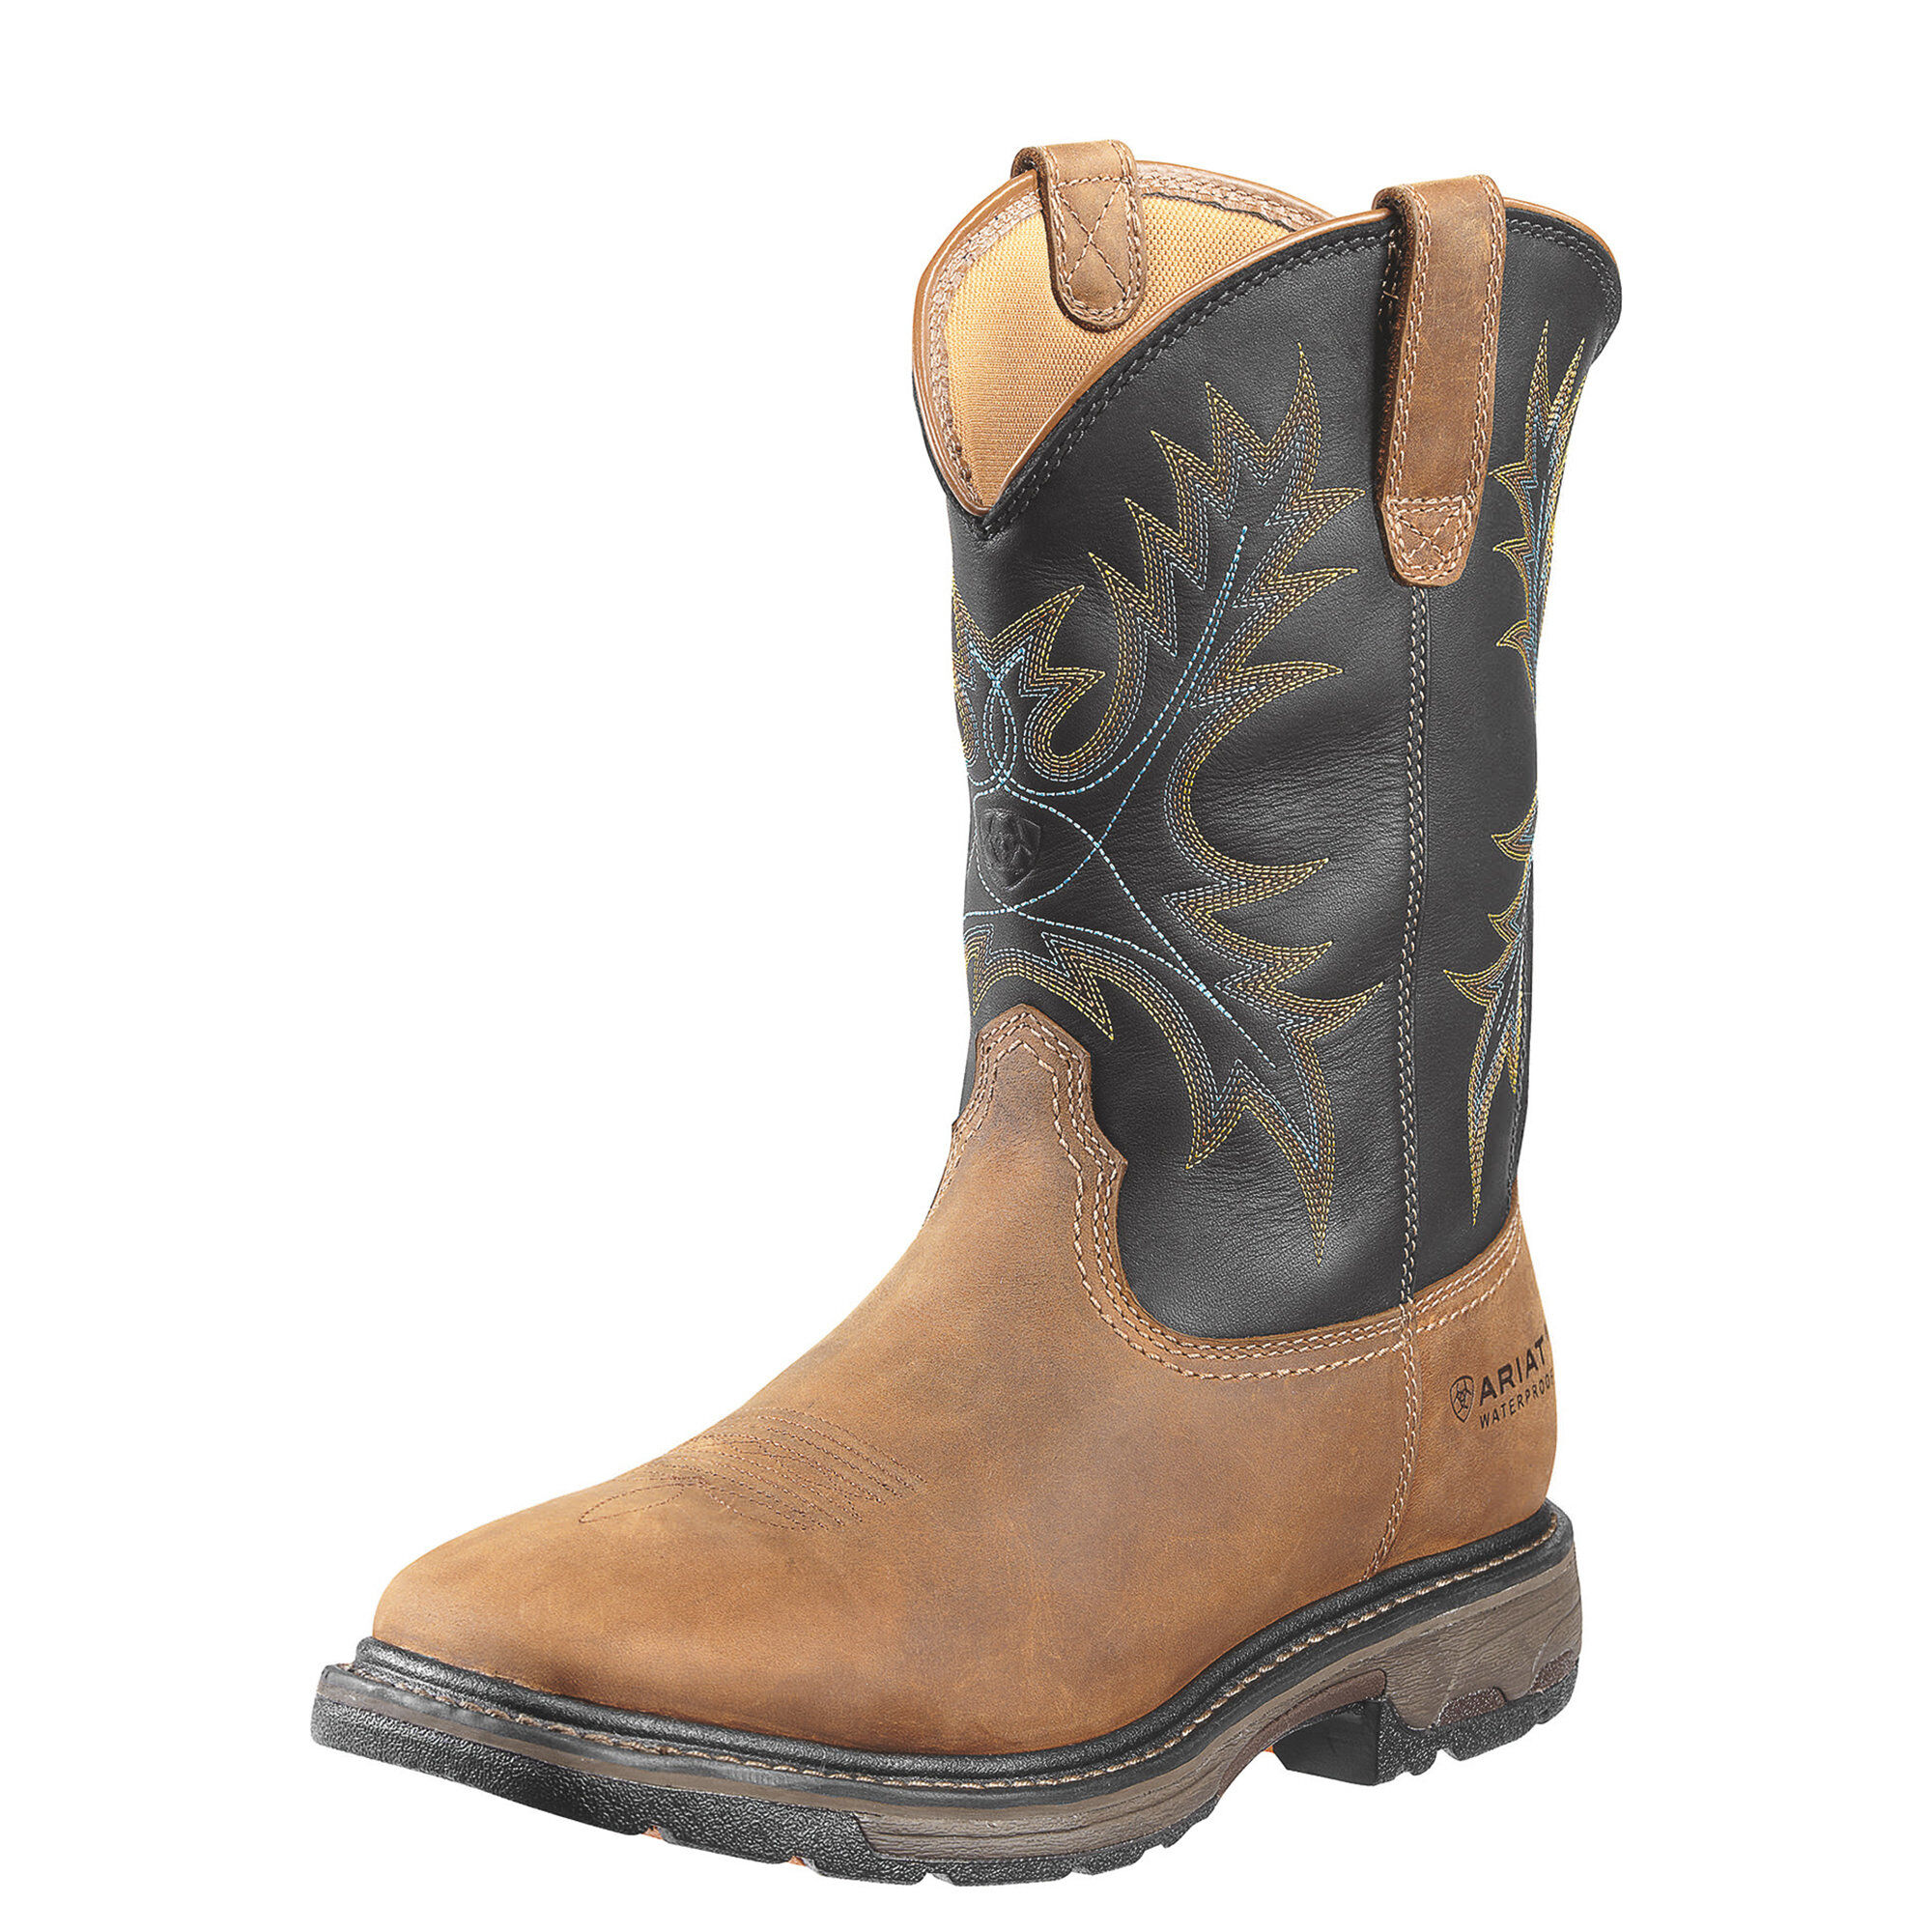 WorkHog Waterproof Work Boot | Ariat